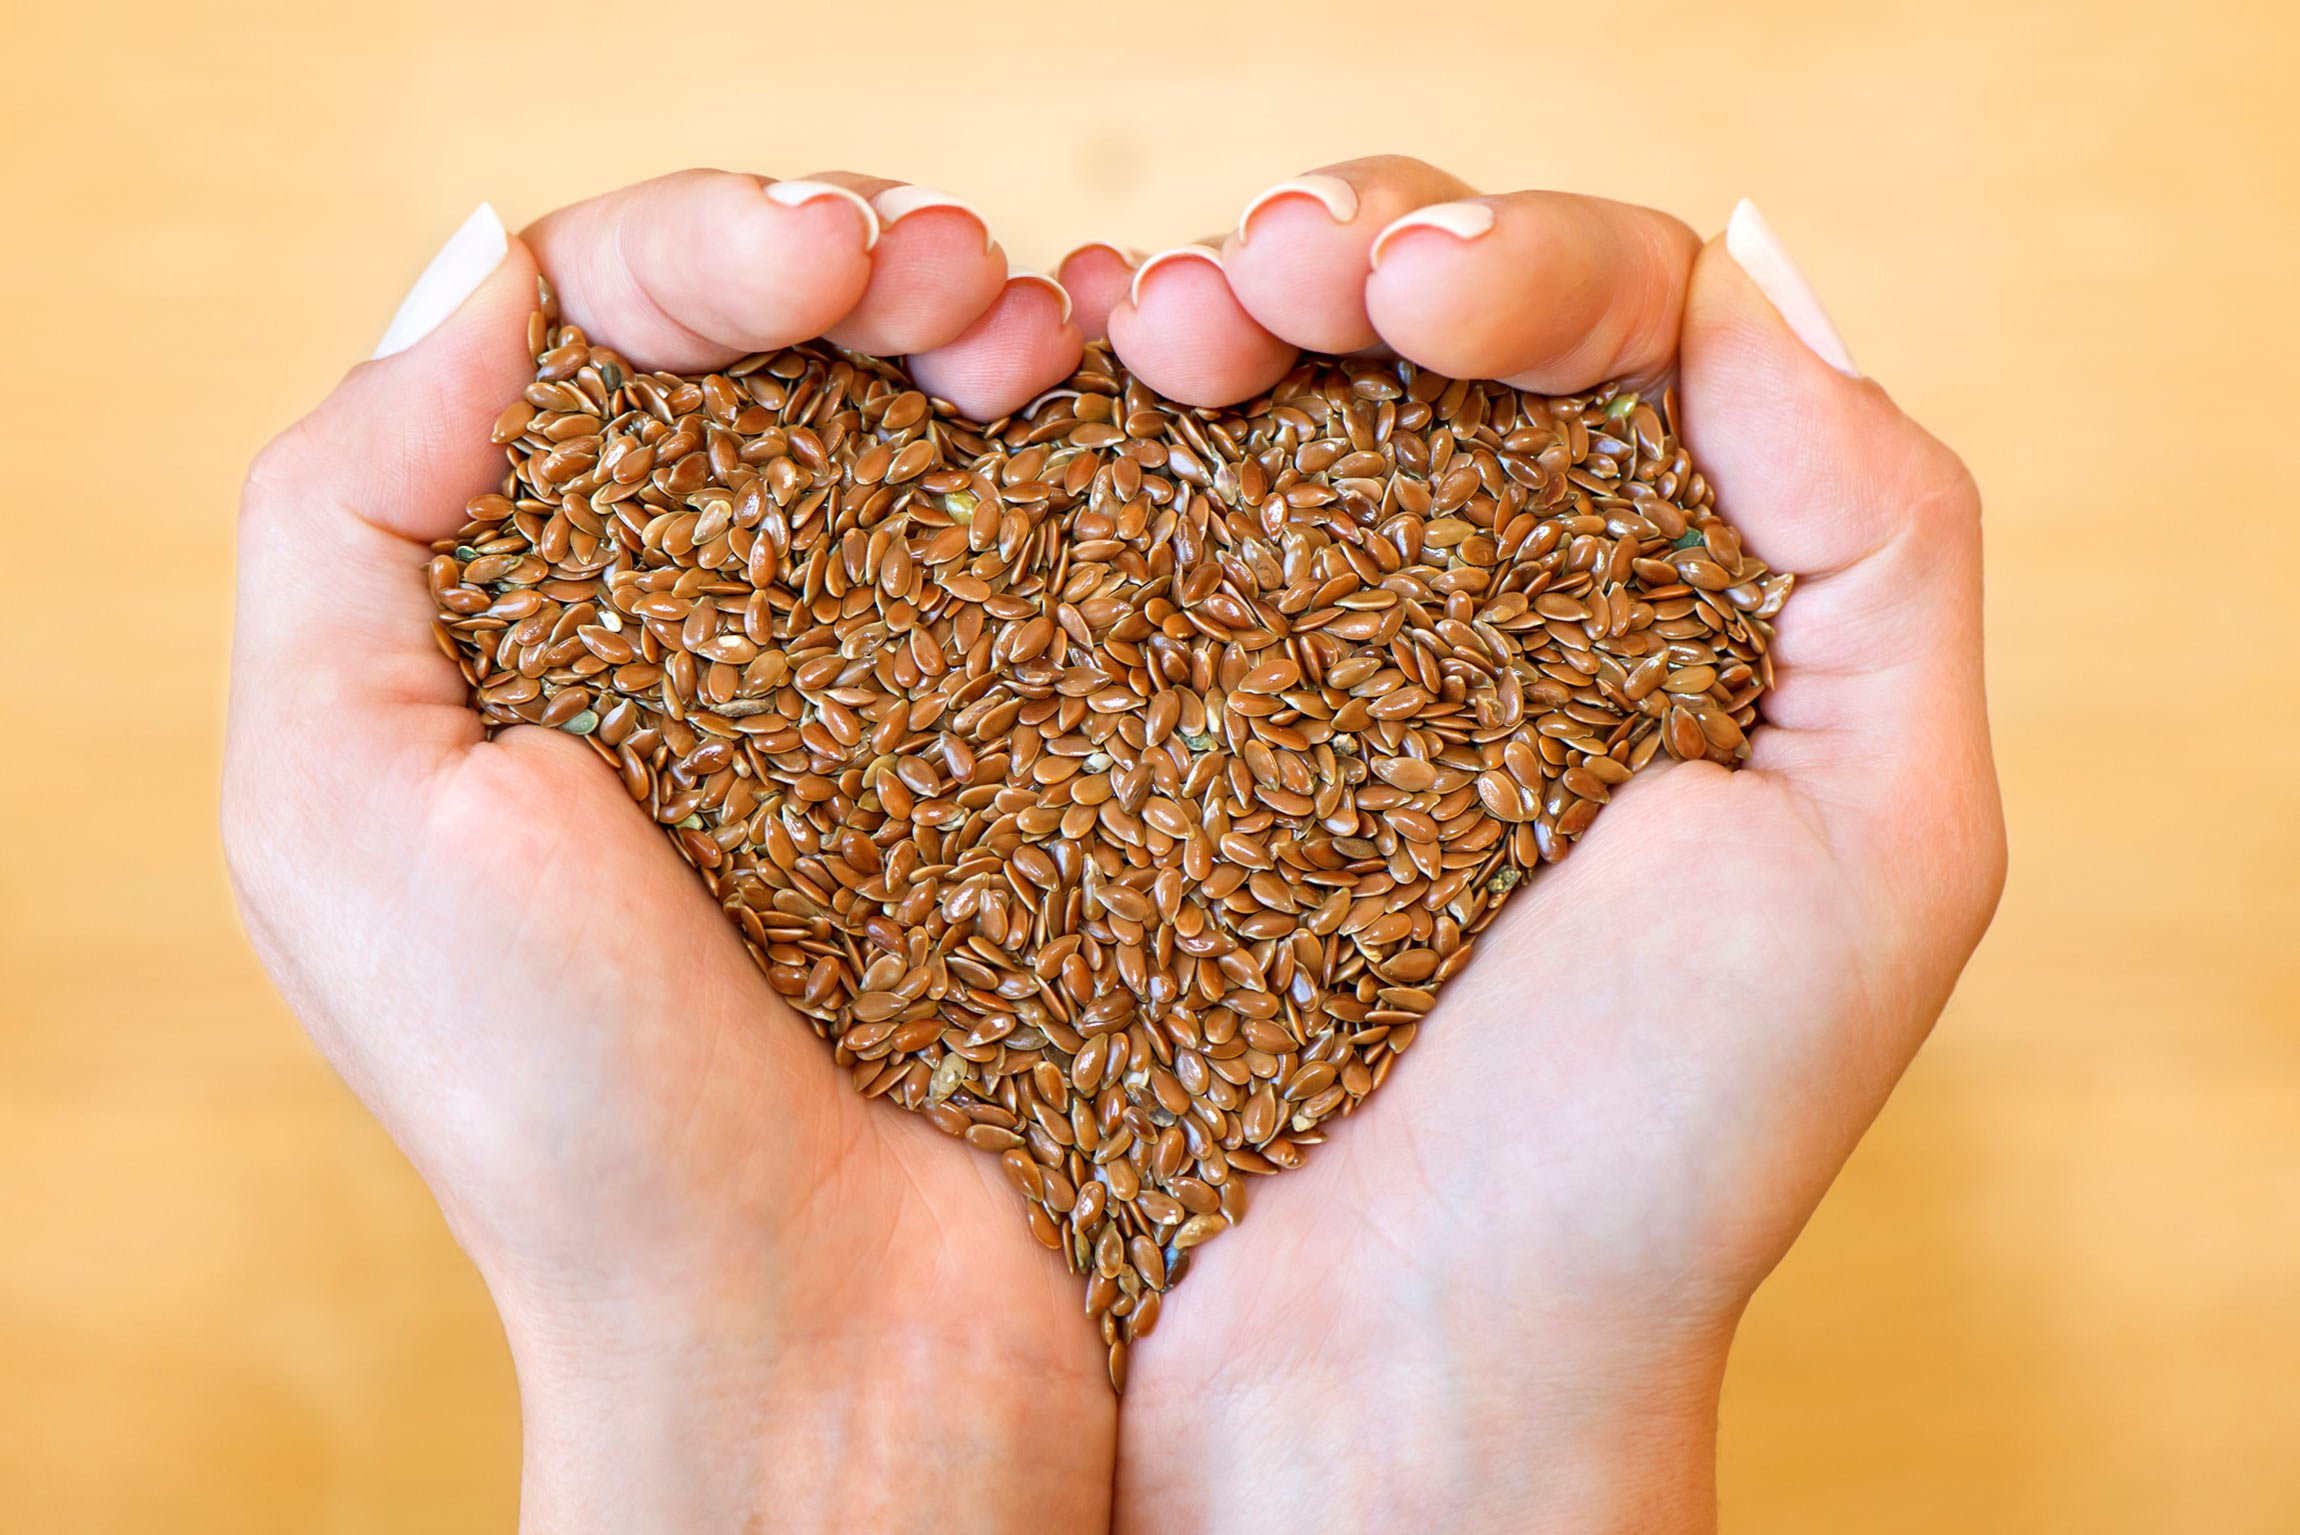 Healthy Snacks: Seeds